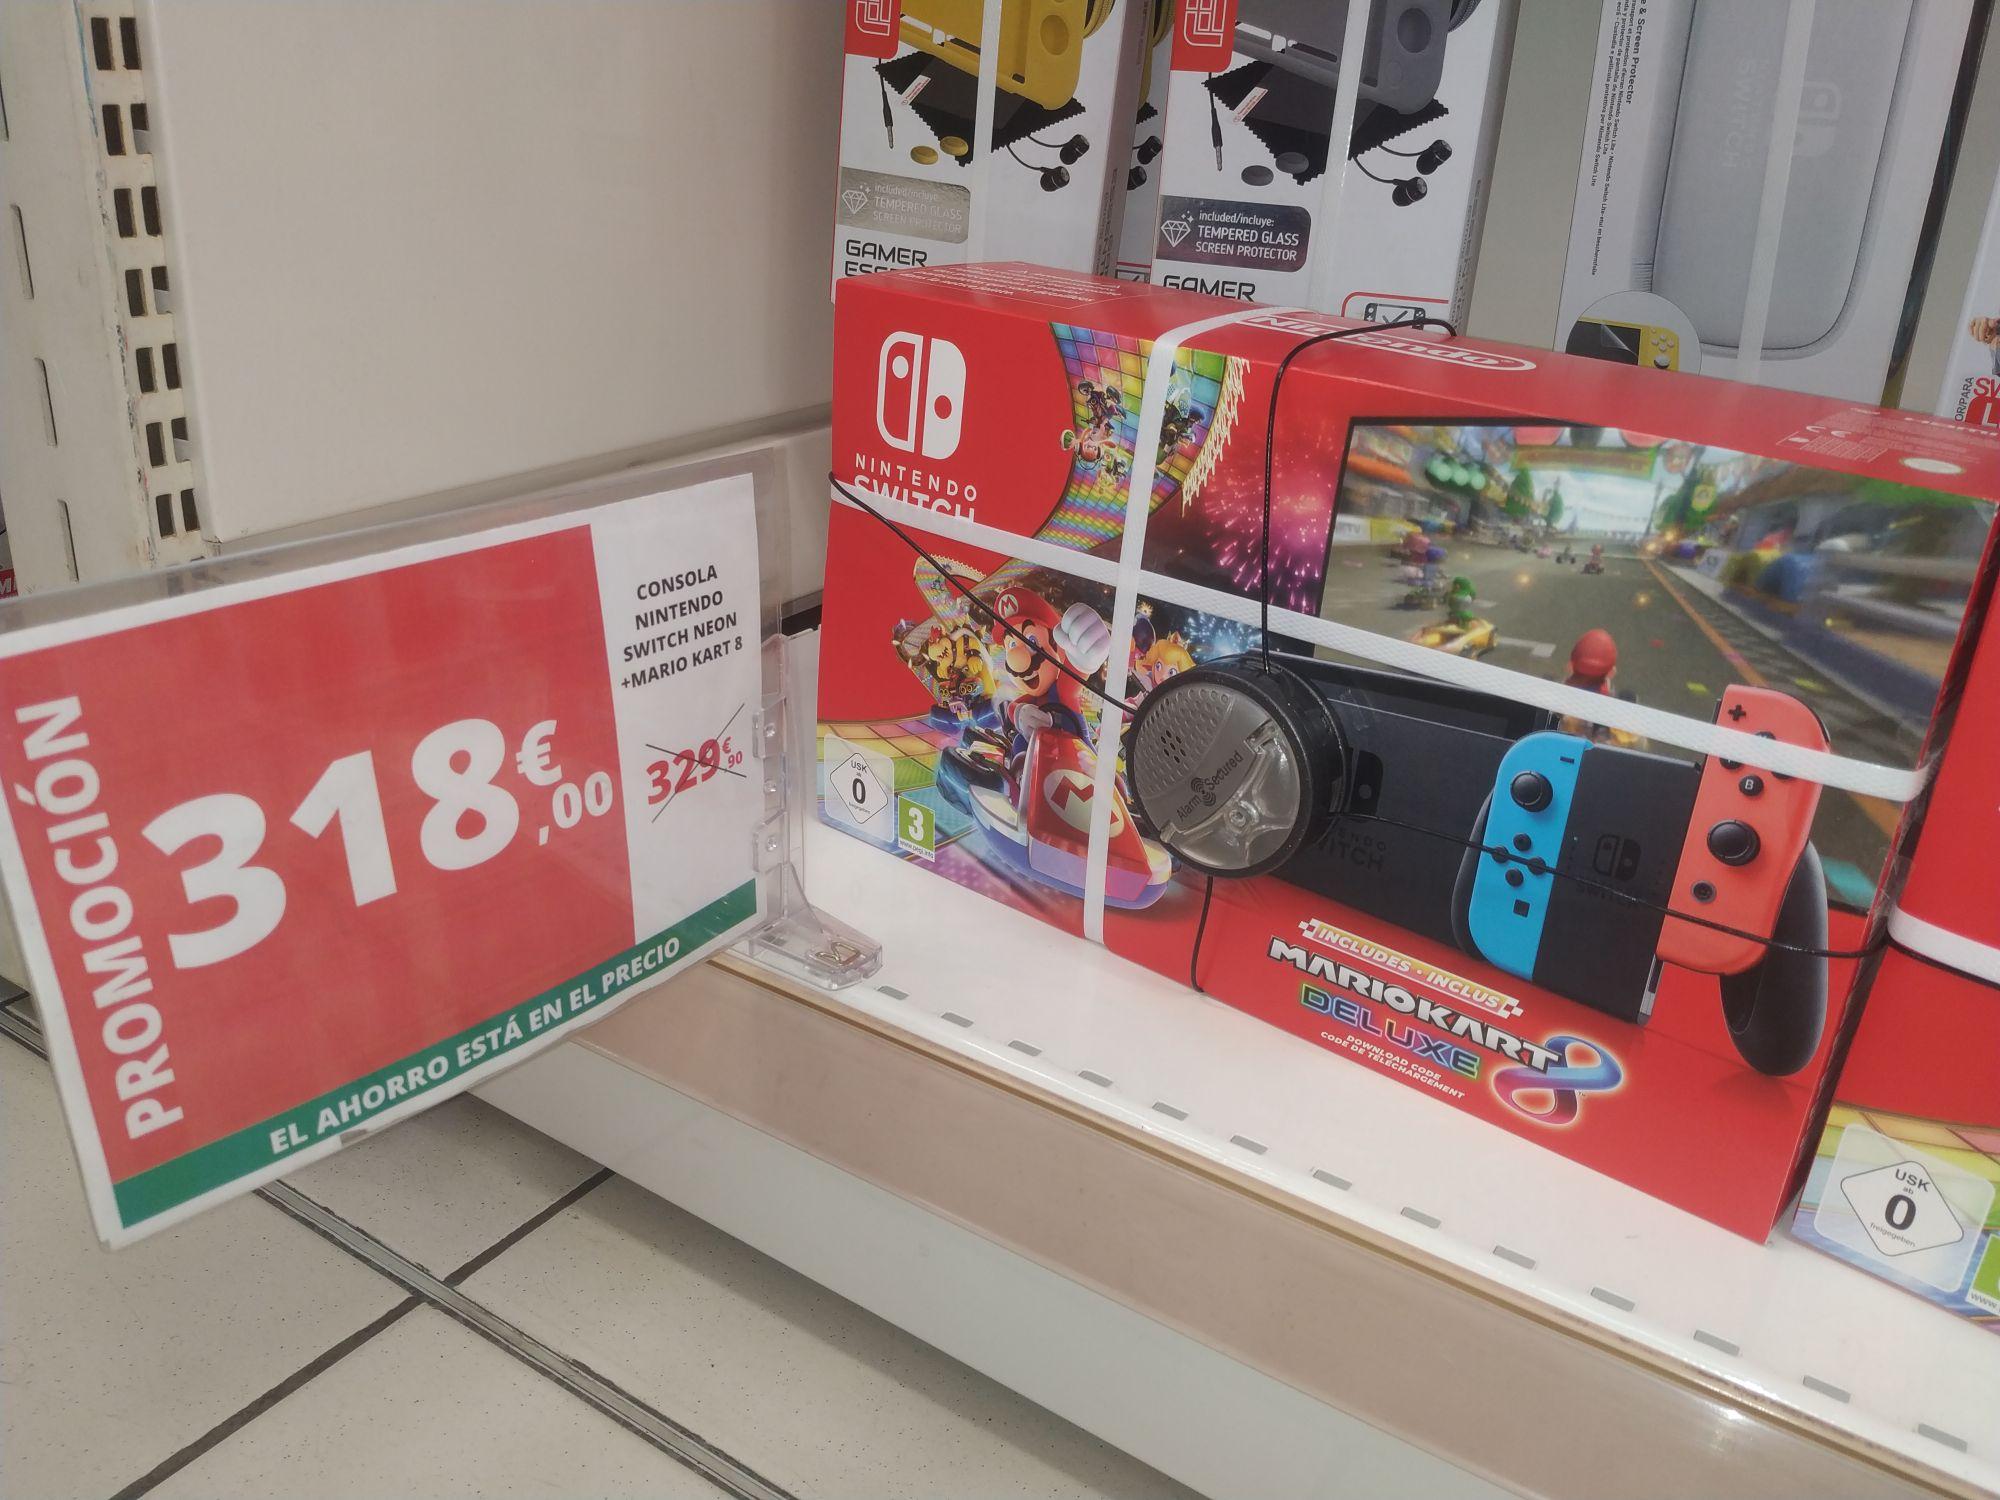 Buen precio para Nintendo Switch Neon + Mario Kart (Alcampo Castellón)